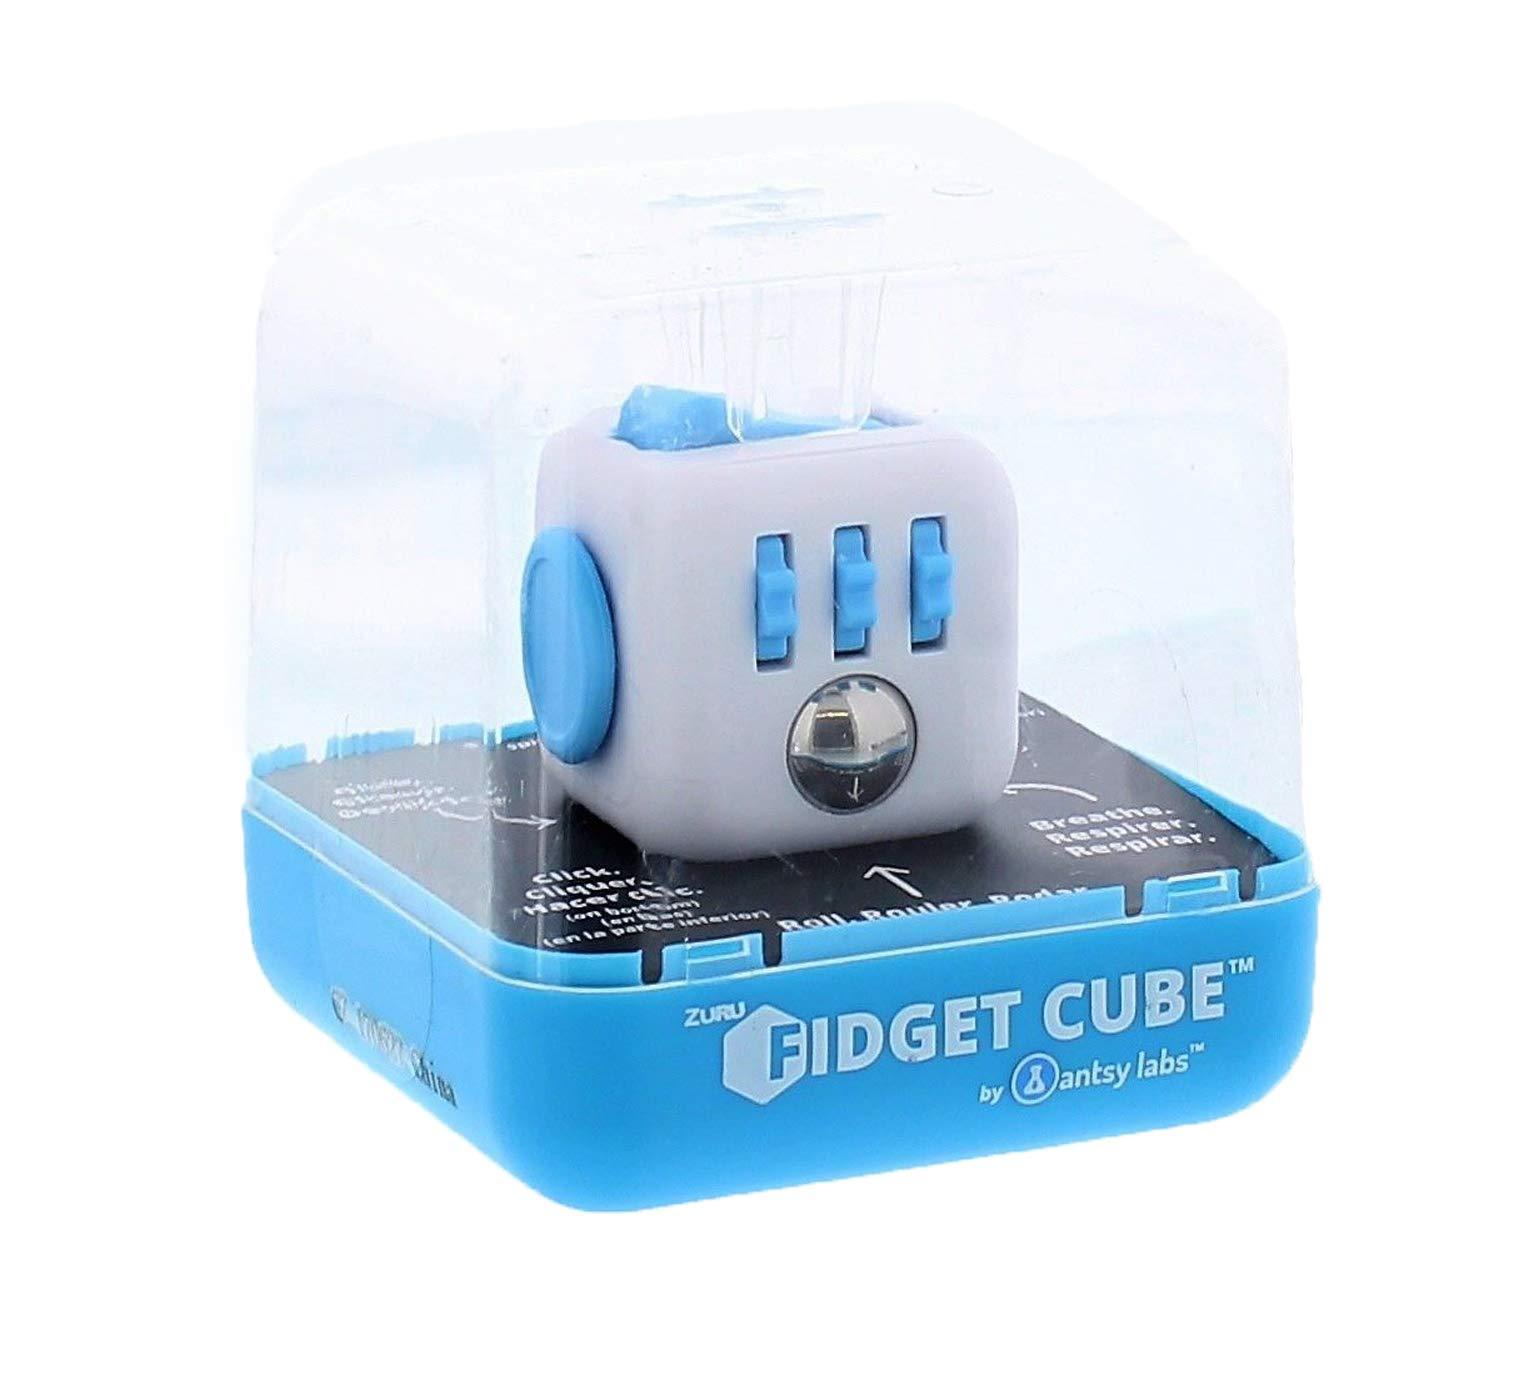 Zuru Fidget Cube by Antsy Labs - The Original Fidget Cube - Aqua Fidget Cube